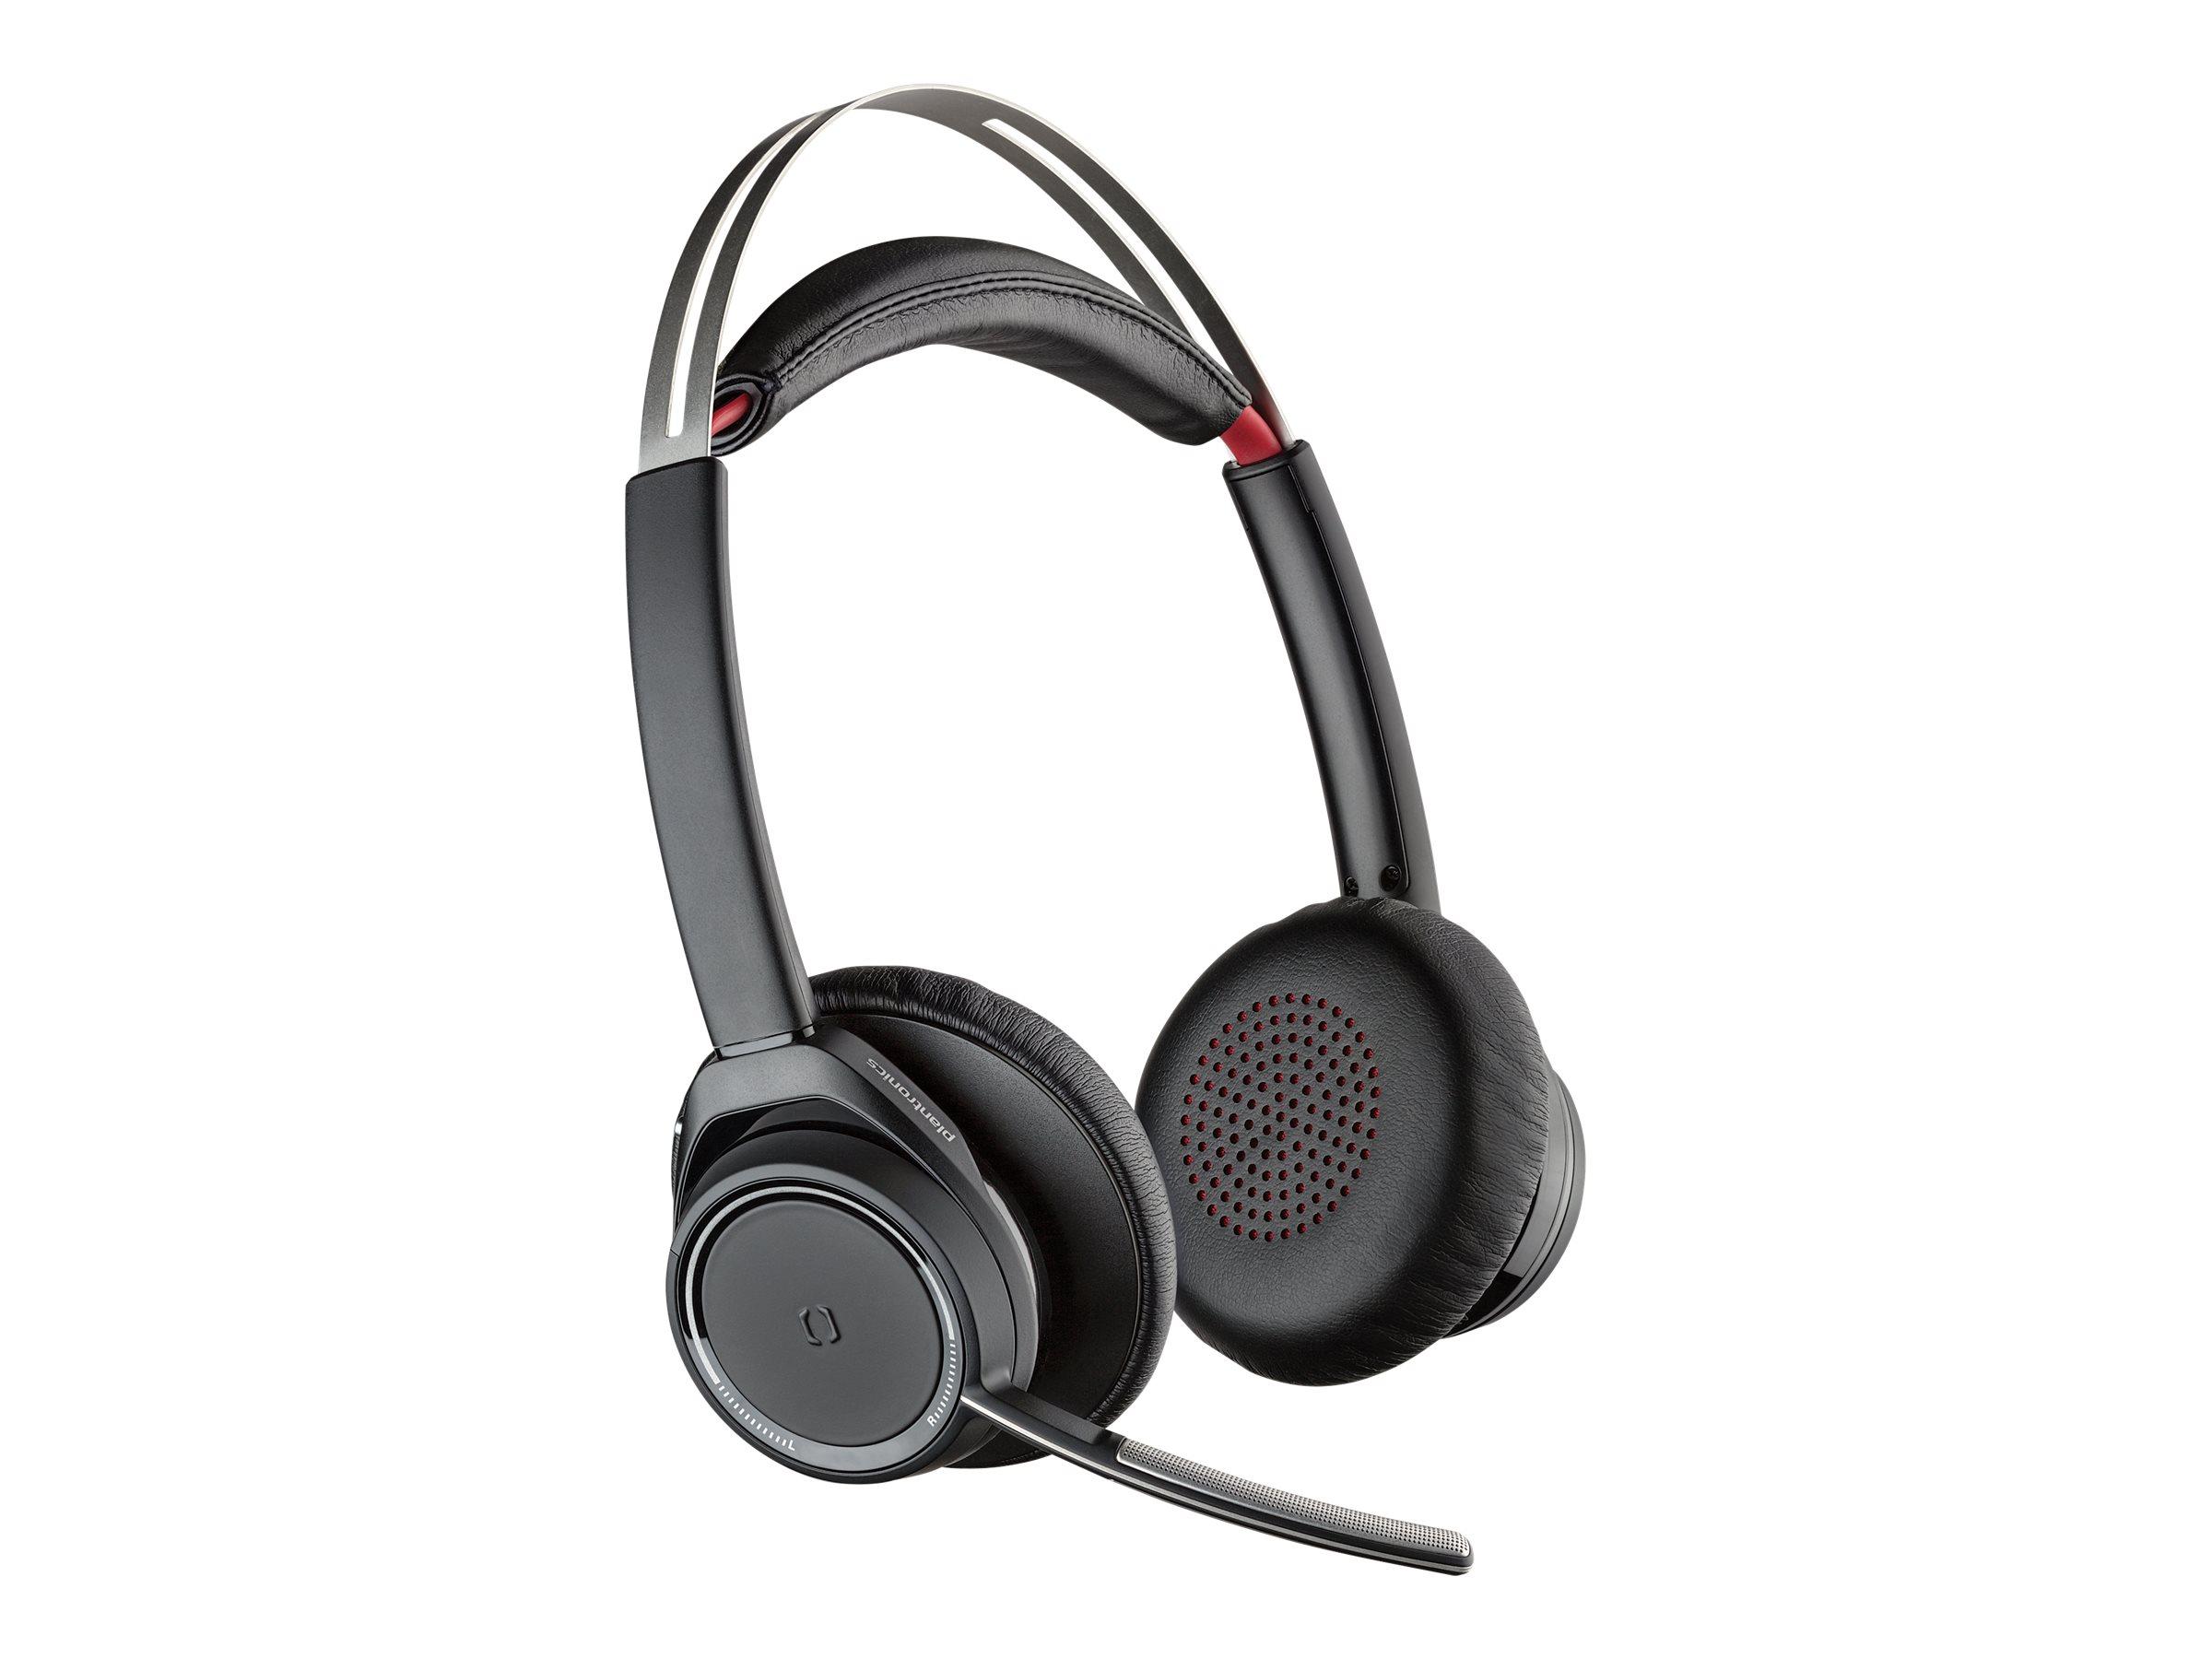 Plantronics Voyager Focus UC B825-M - Kein Ladegerät - Headset - On-Ear - Bluetooth - kabellos